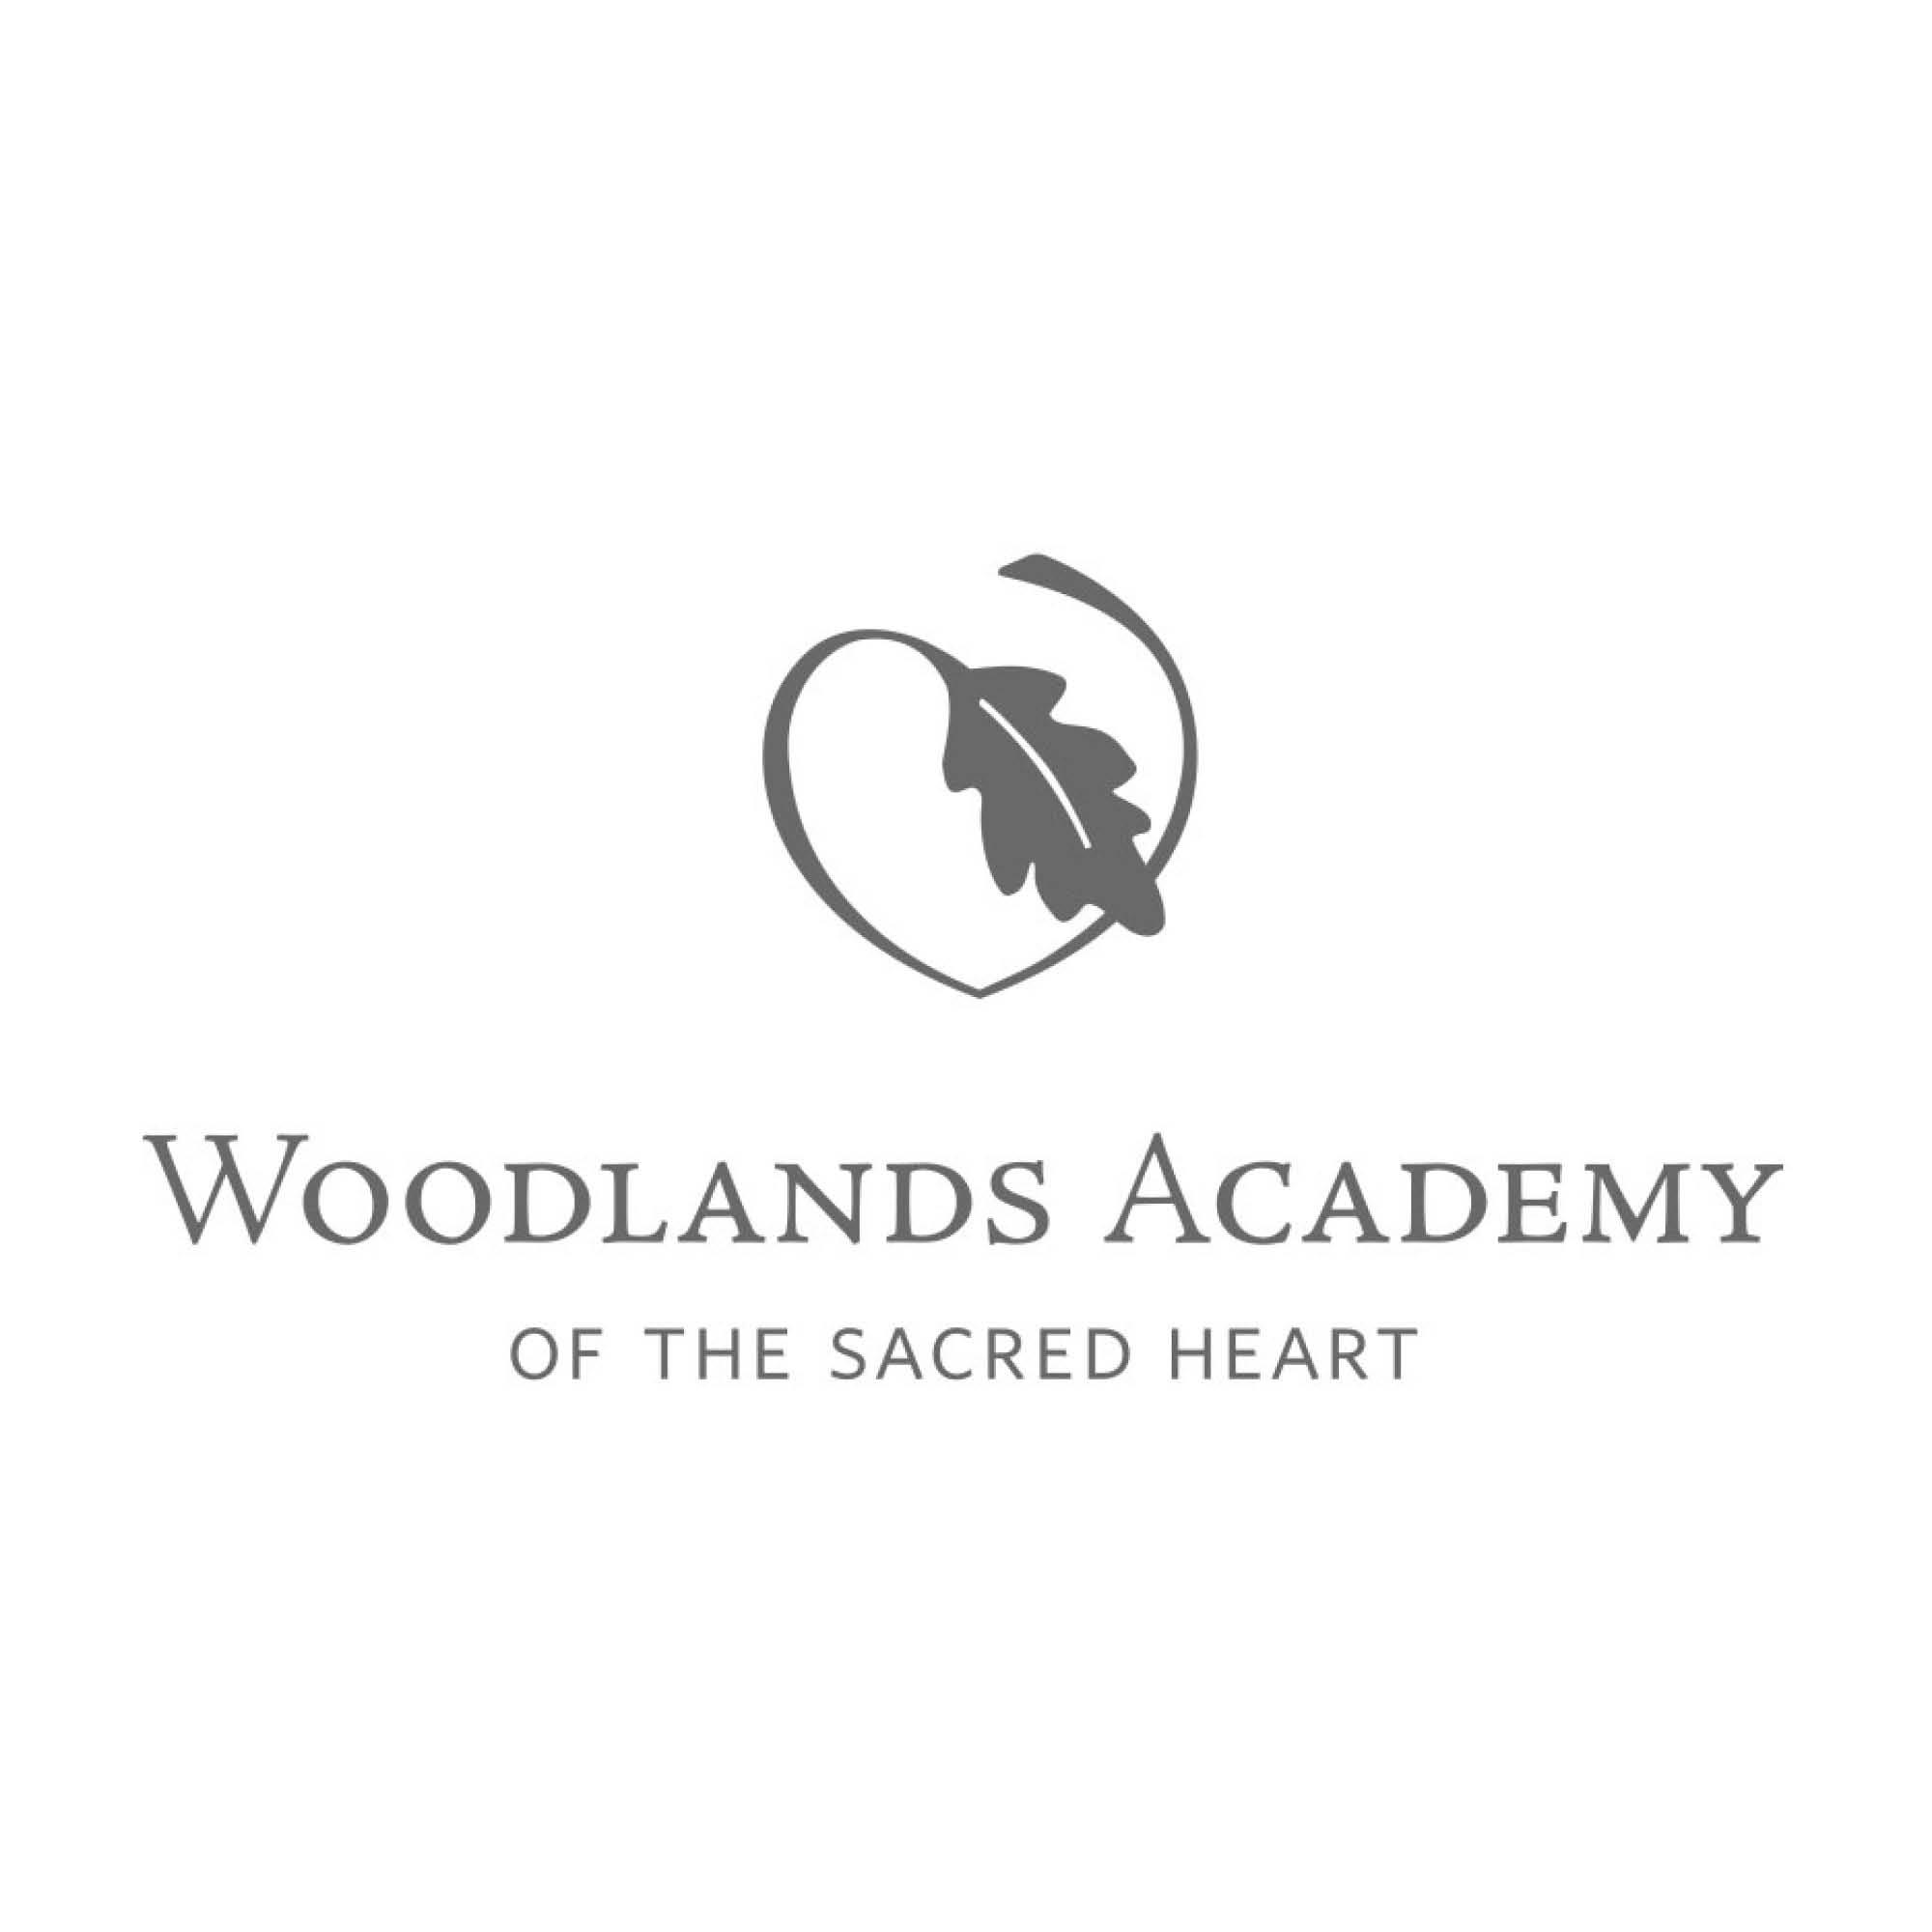 woodlands academy.jpg